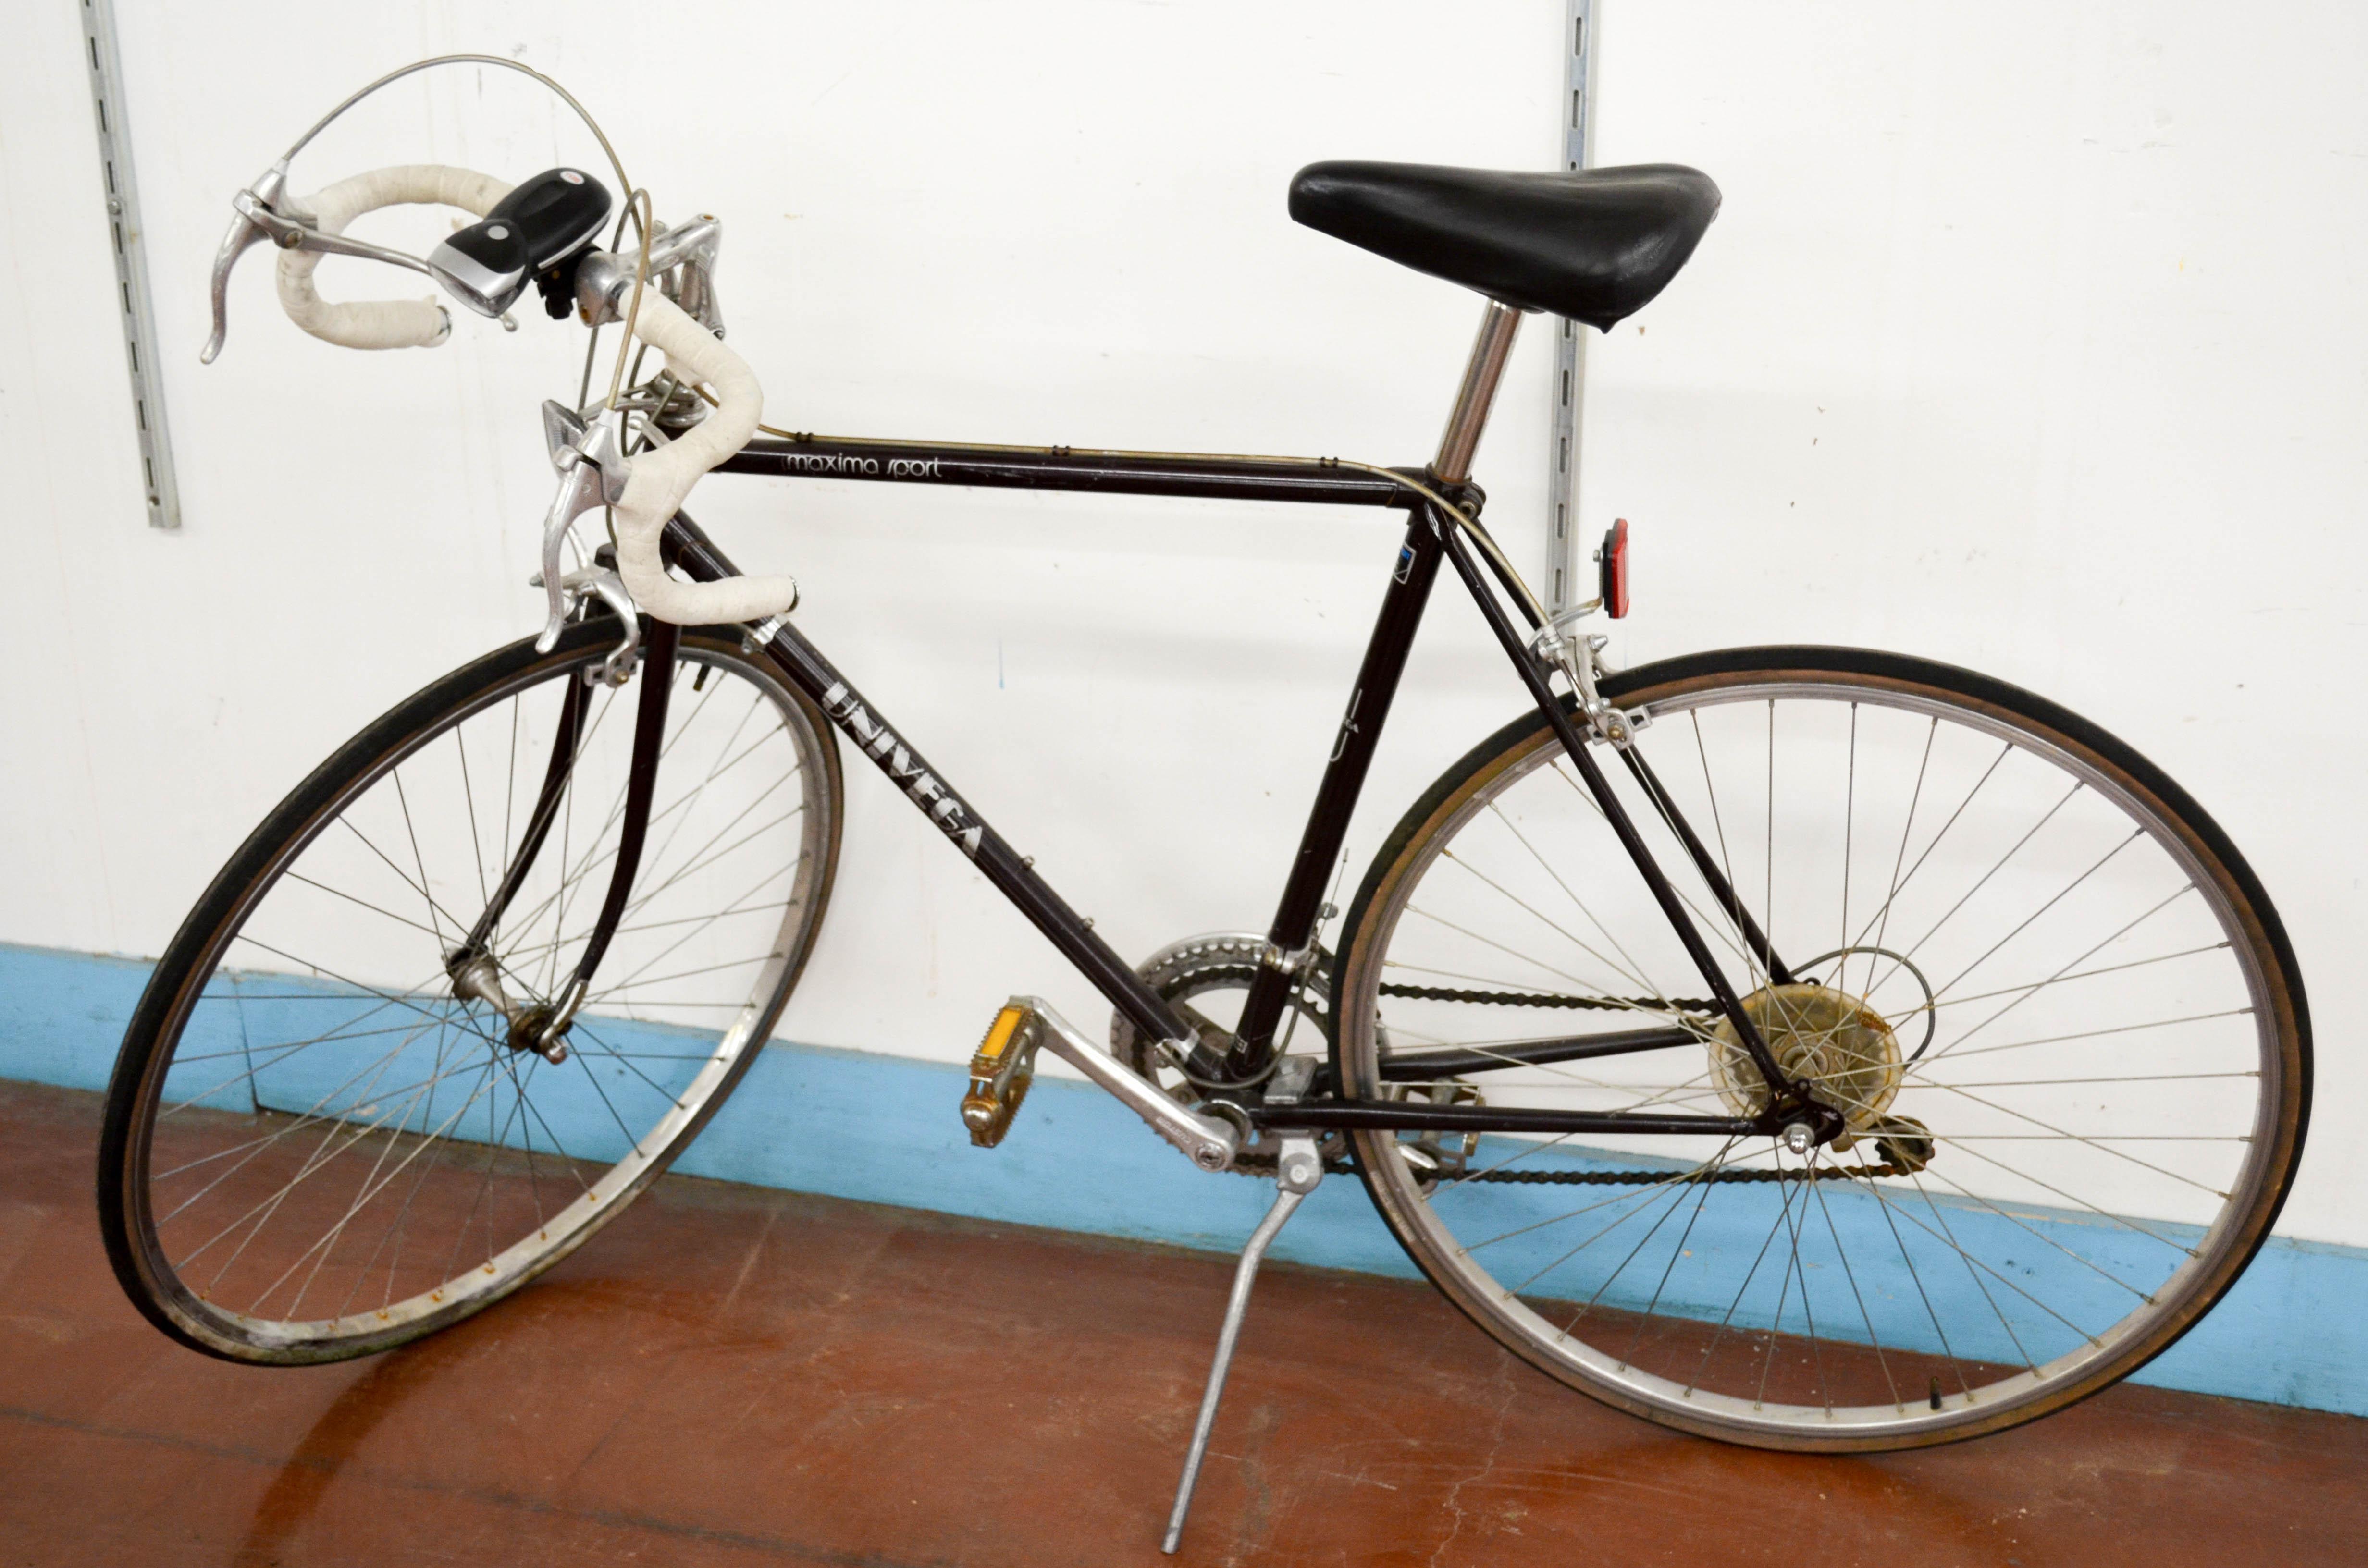 105 Univega Maxima Sport Bike